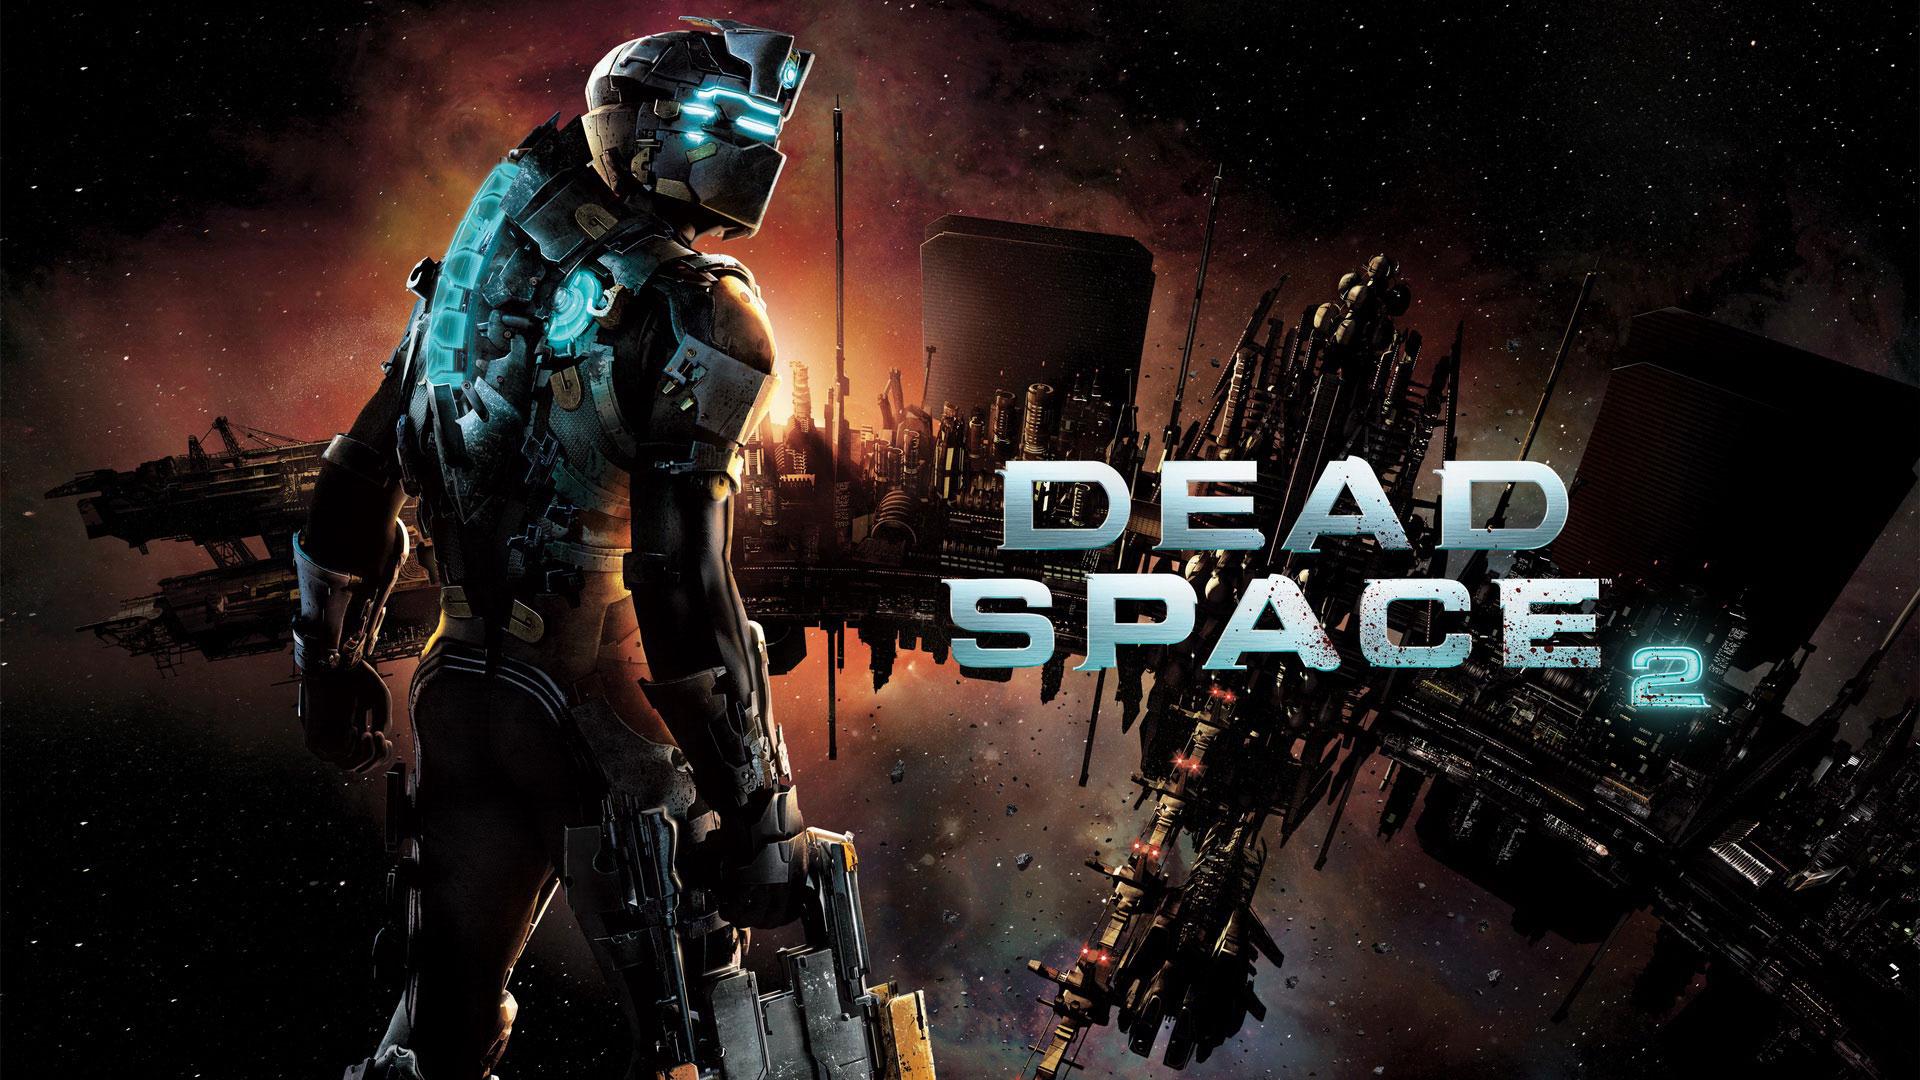 Dead Space 2 Wallpaper Hd - WallpaperSafari